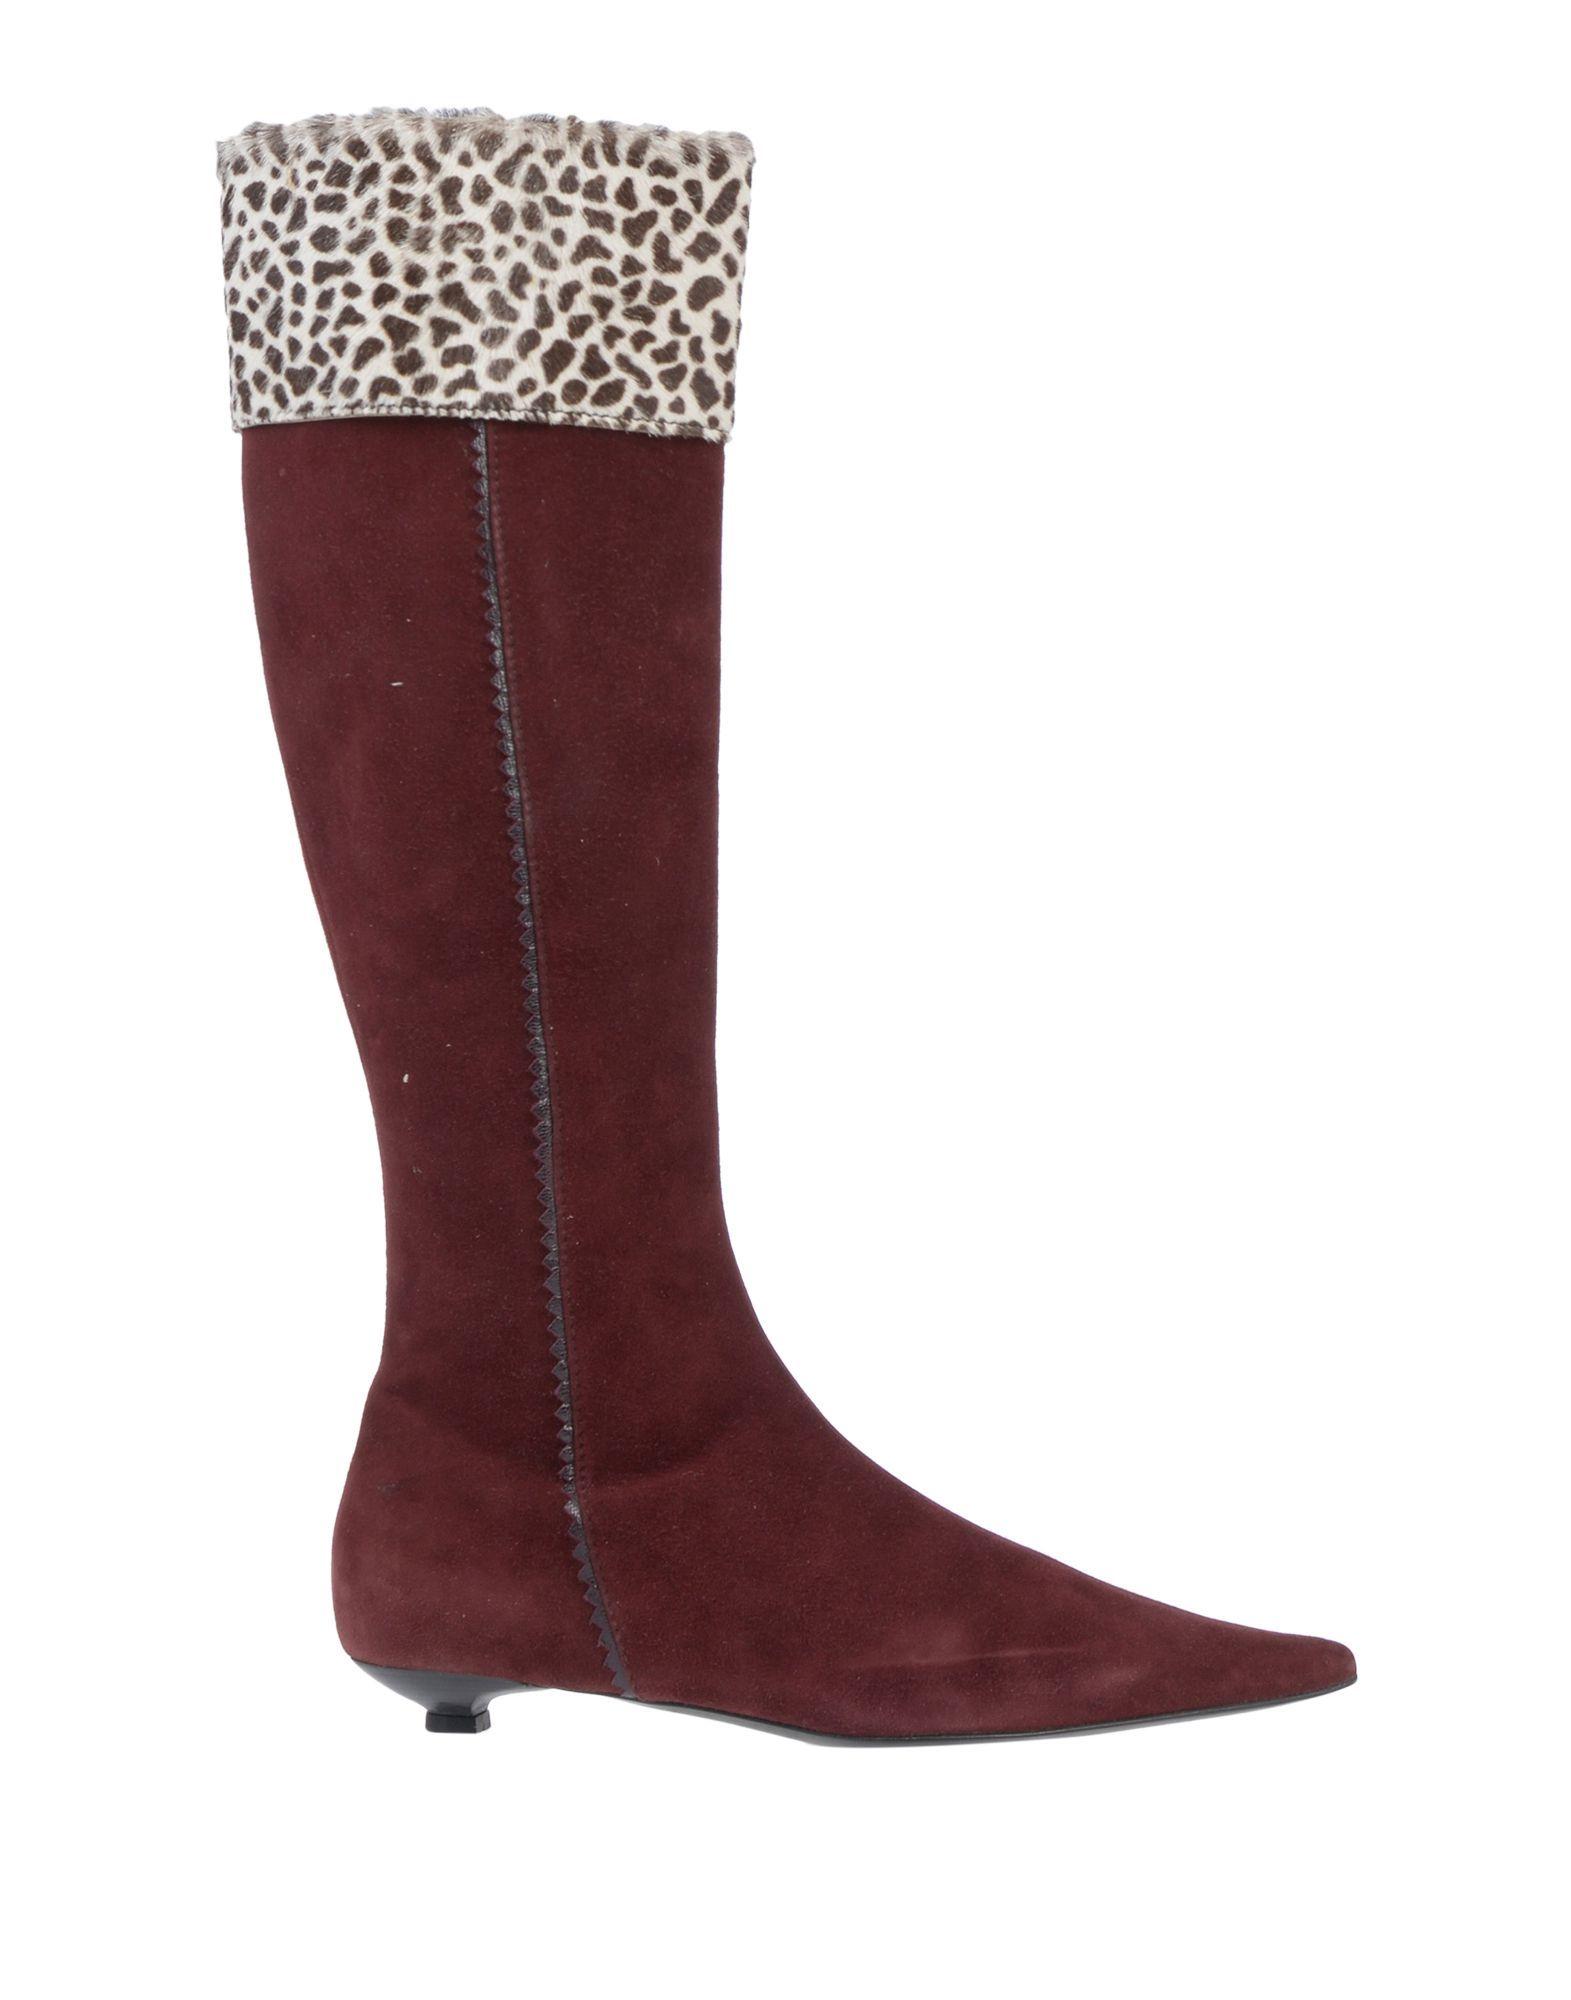 Missoni Women's Boots Maroon Leather